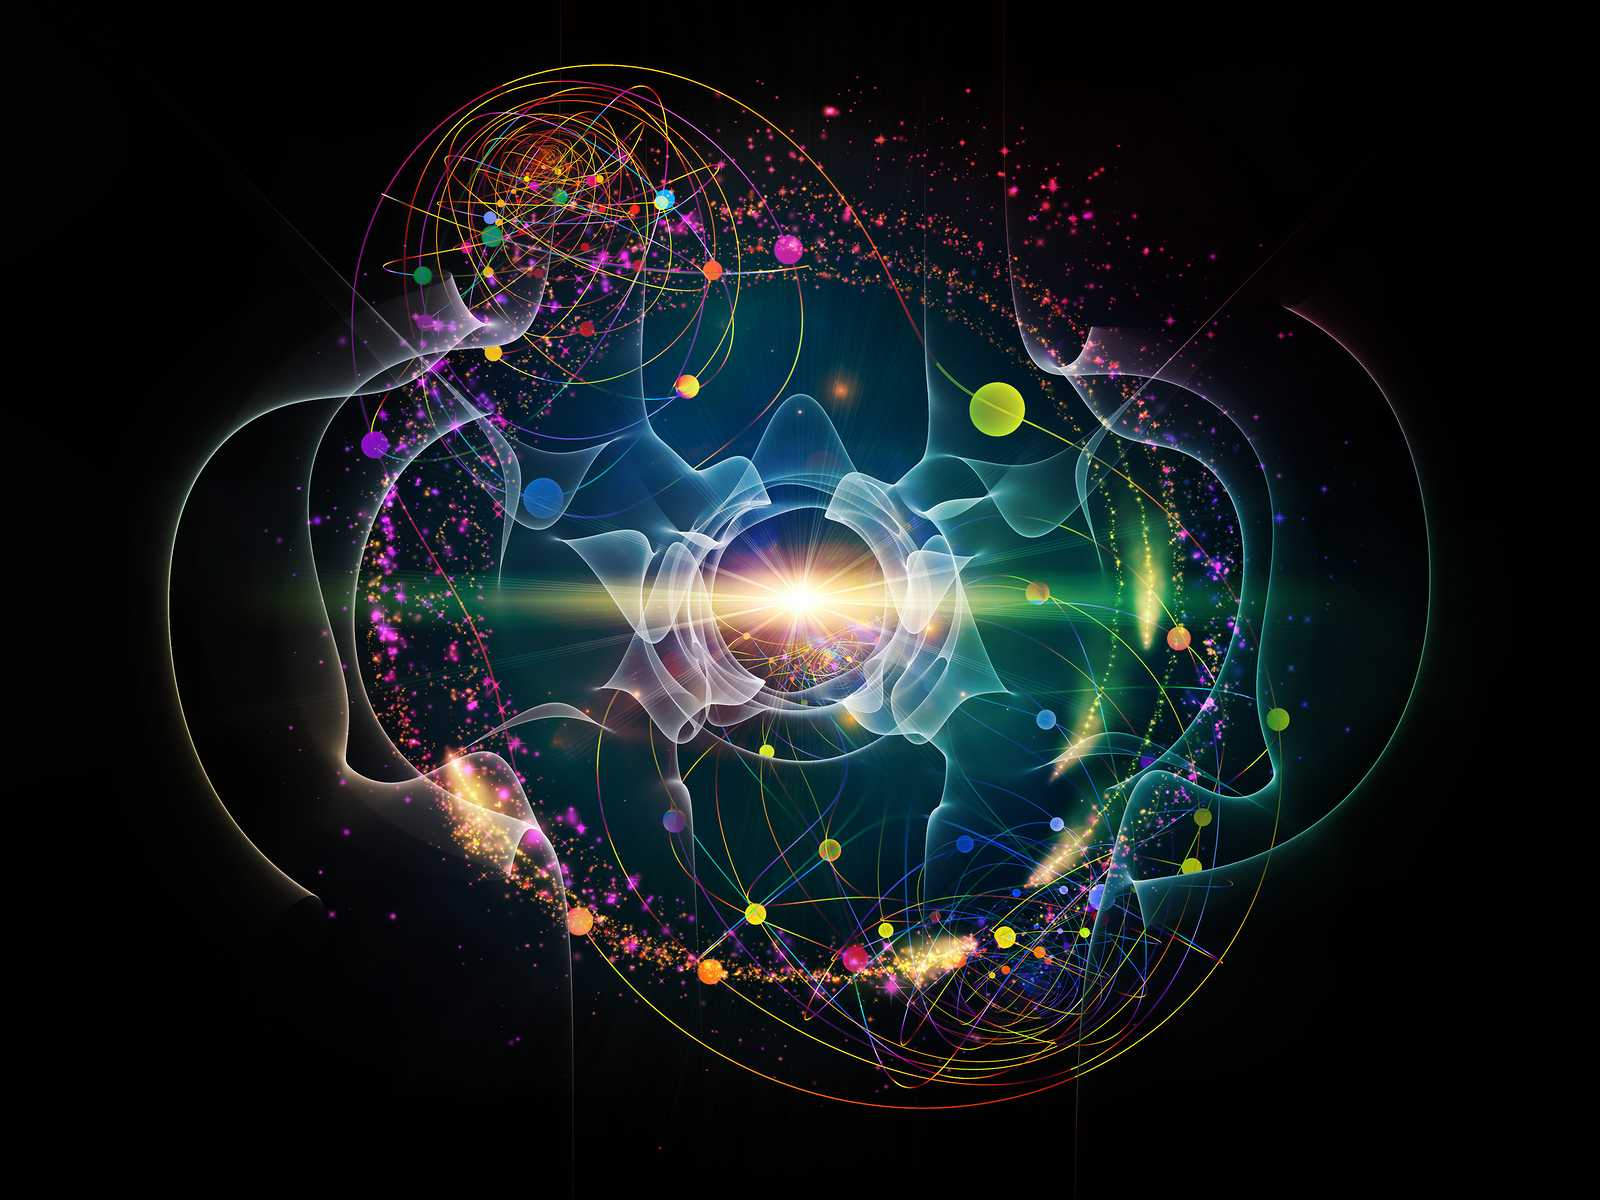 Like Neutrinos for Stem Cells 1600x1200